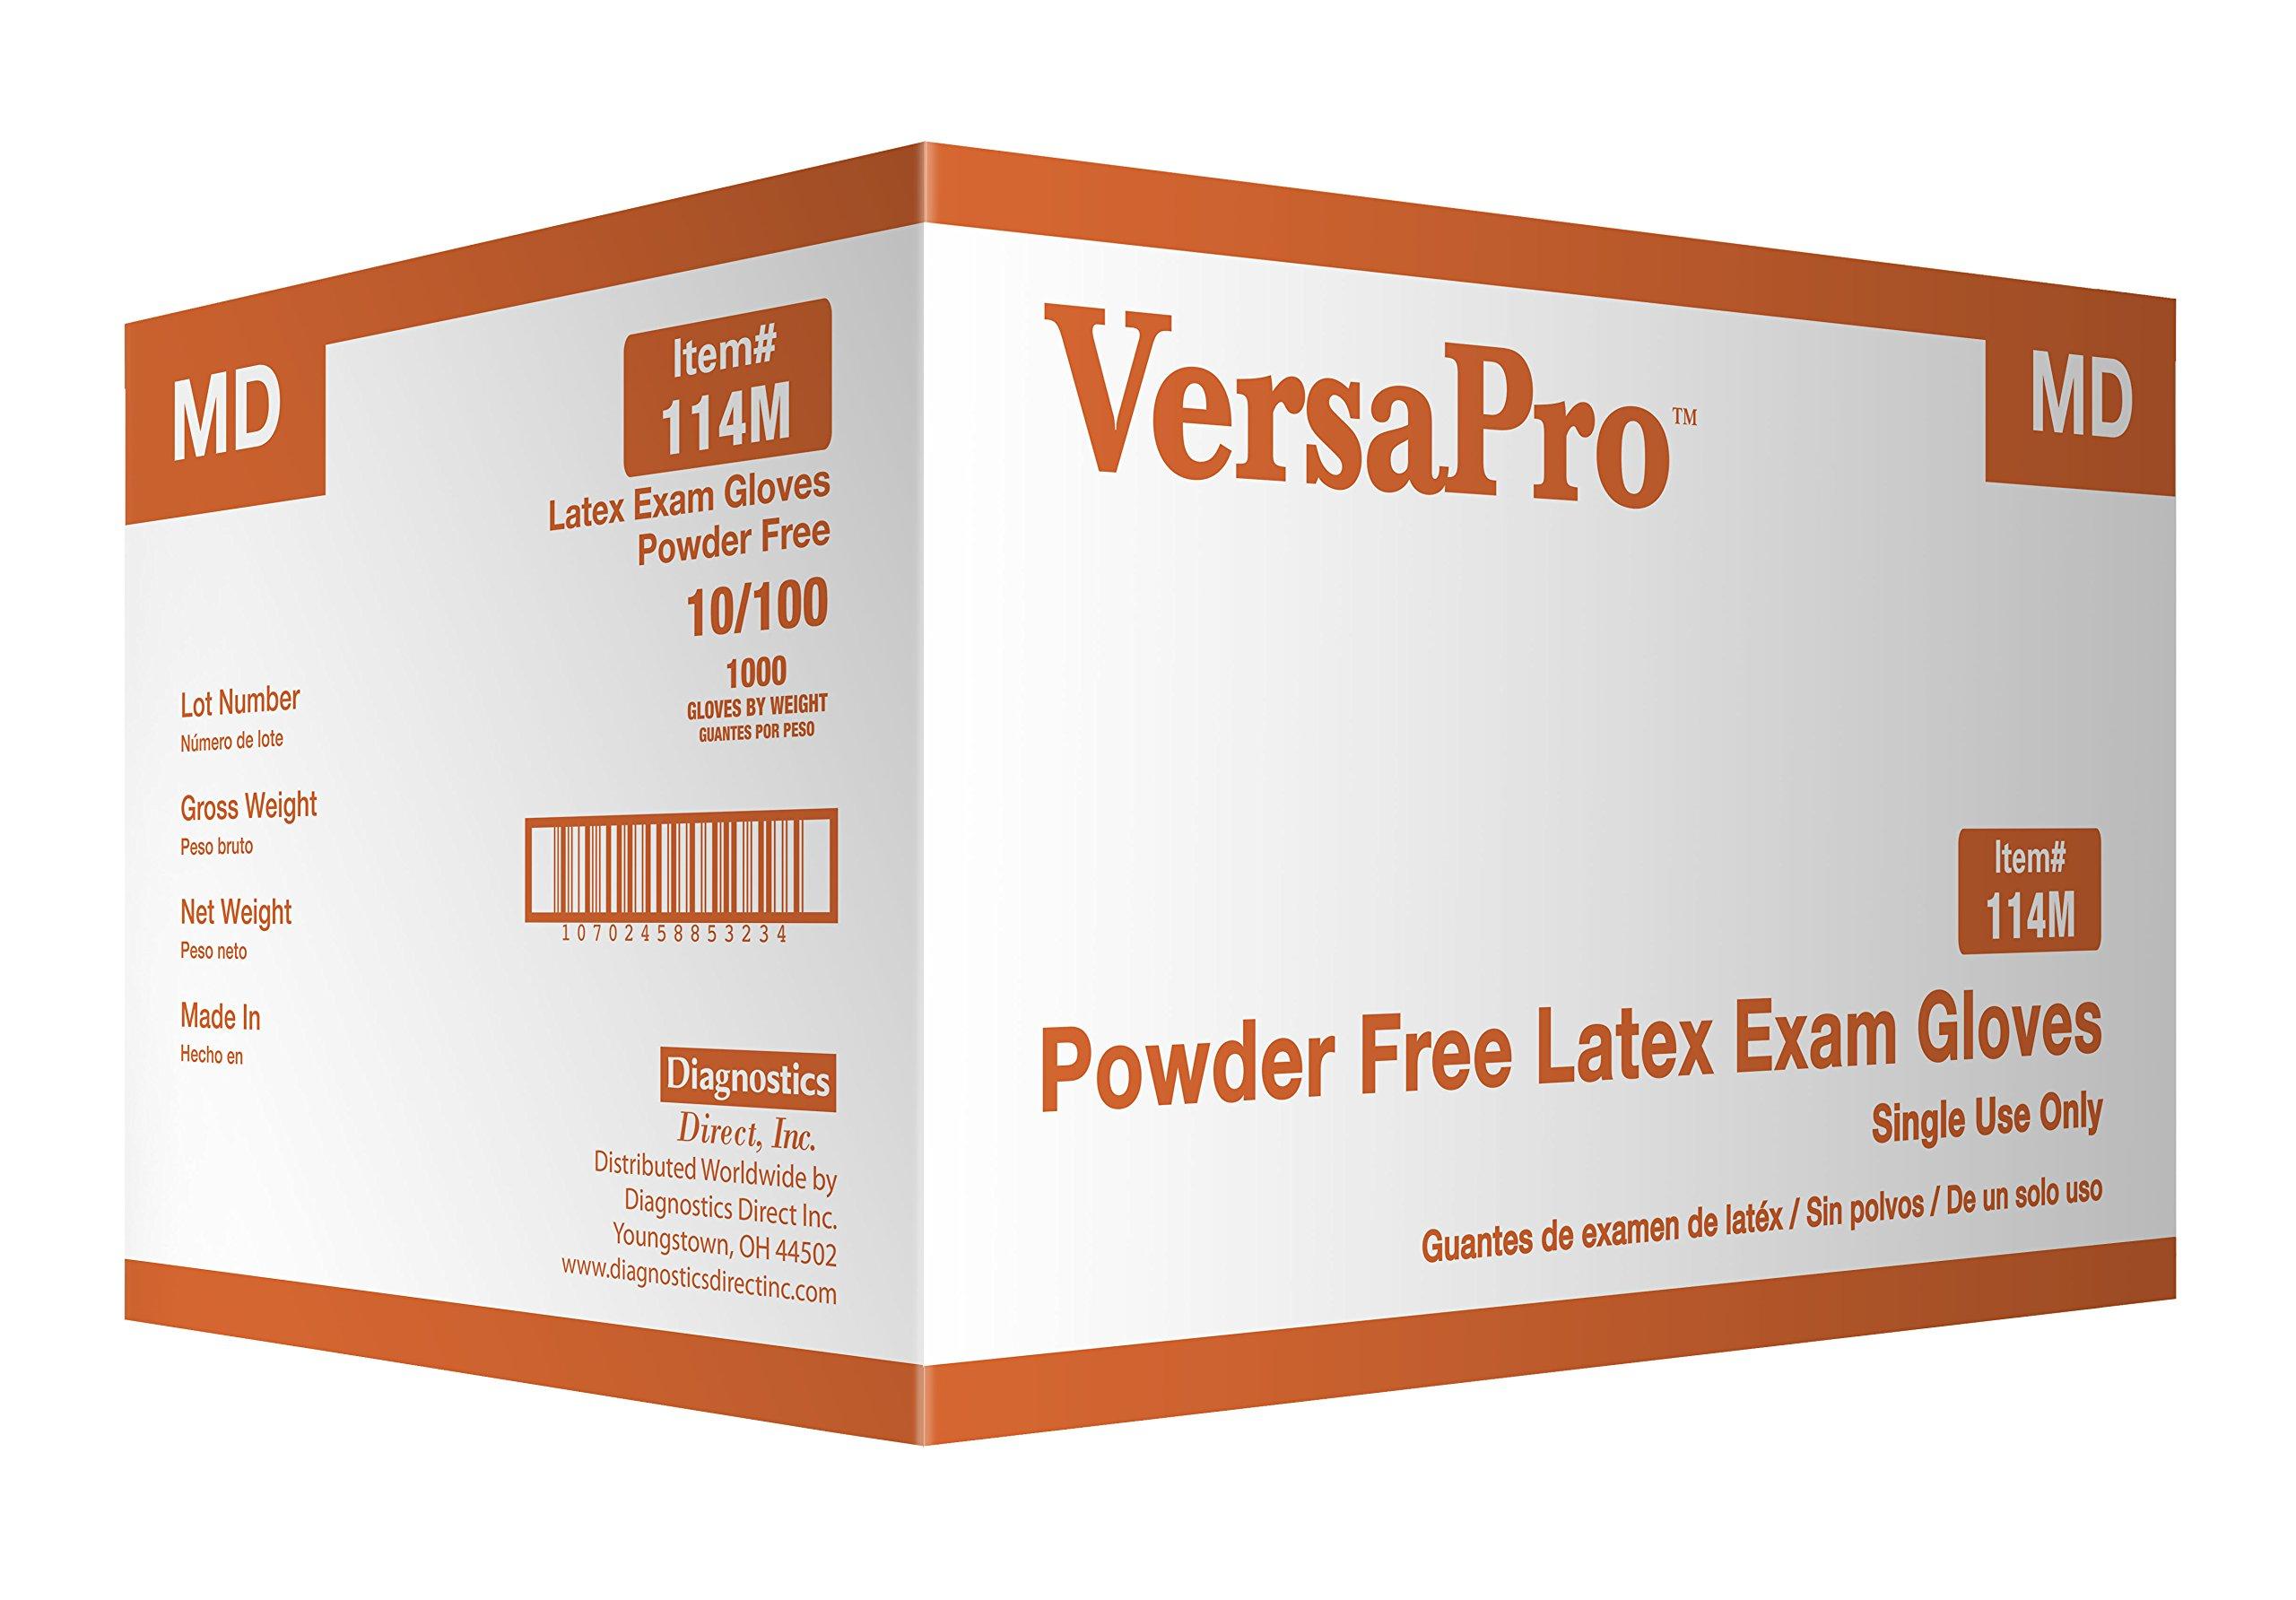 Diagnostics Direct 114CM Latex Exam Gloves Powder Free, Medium (Pack of 1000) by Diagnostics Direct, Inc.